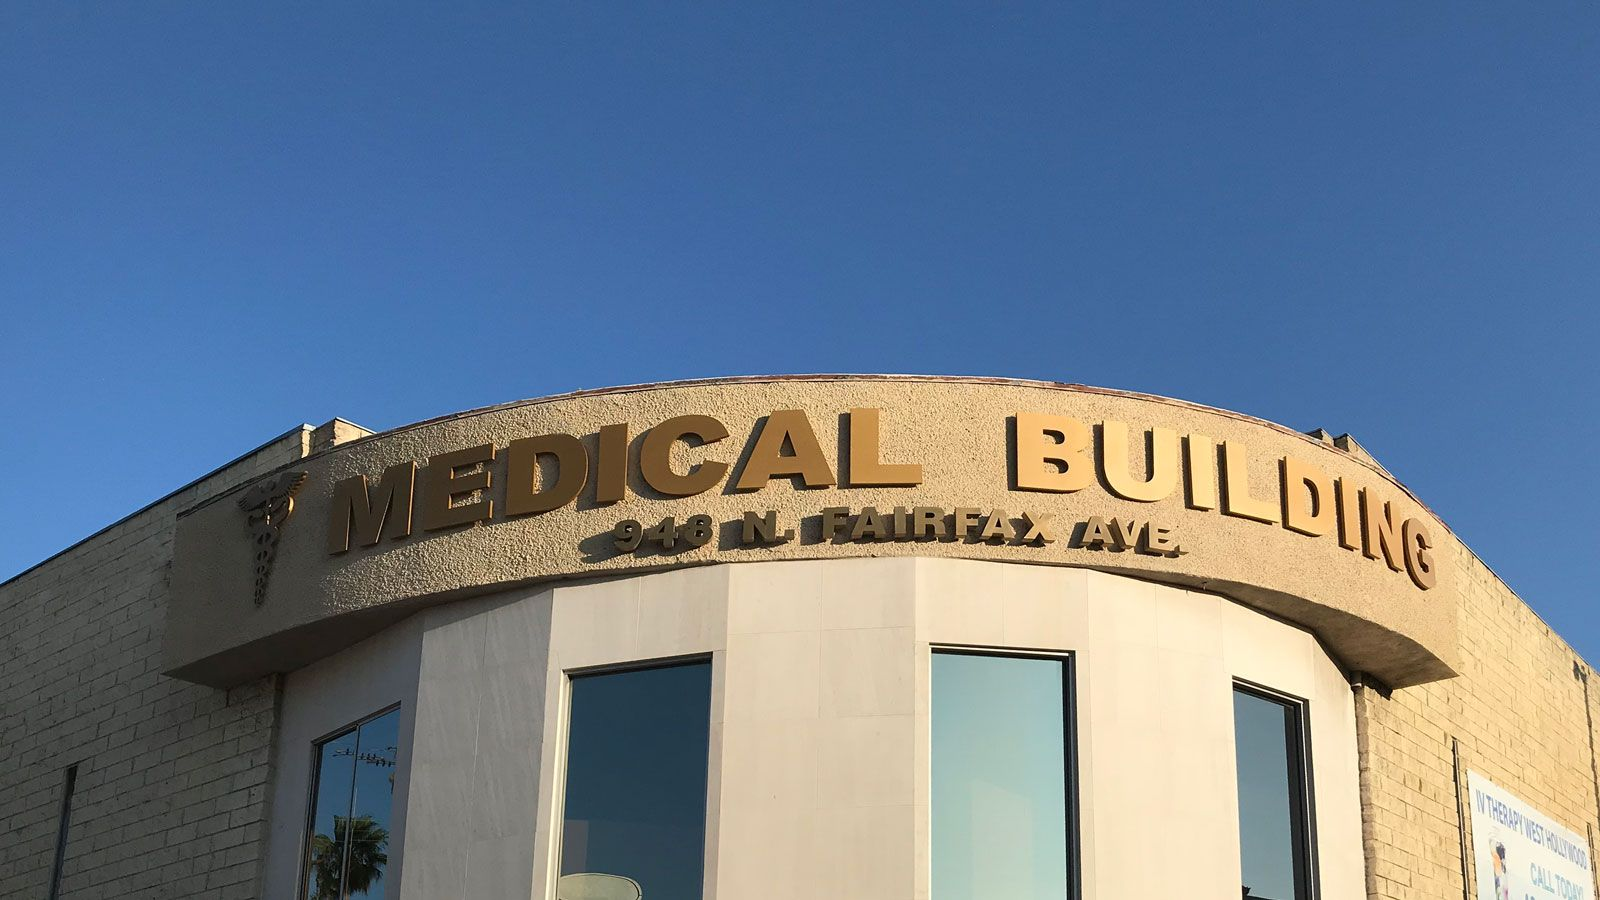 Medical Building custom 3d plastic letters and logo sign in golden color made of PVC for storefront branding